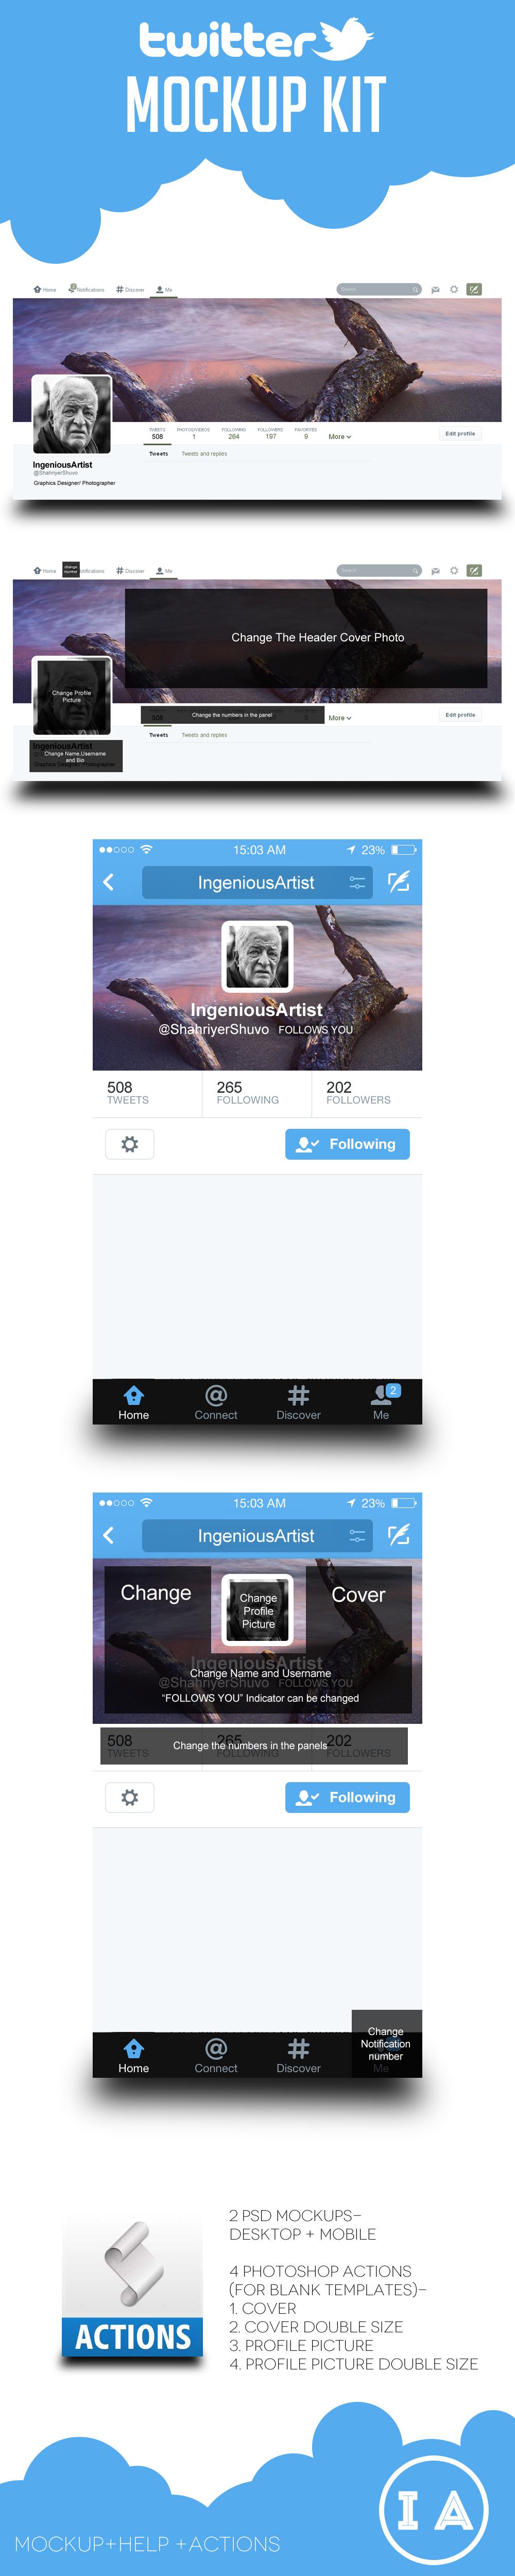 Twitter Kit (Freebie) by shahriyer